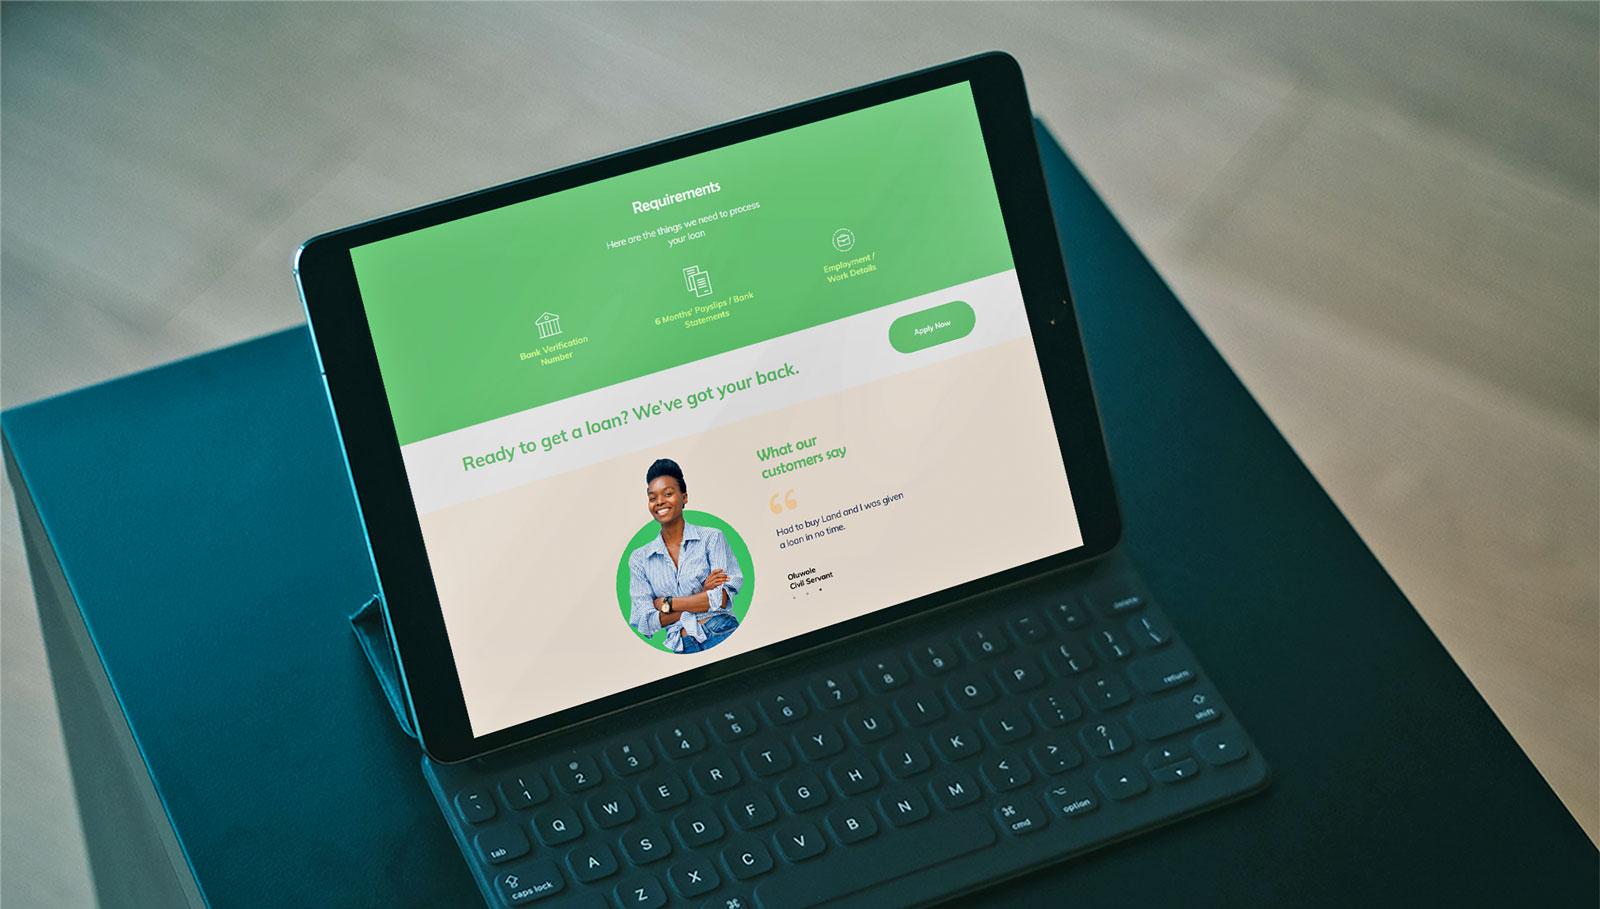 efinance ipad screenshot of loan origination web app by unotech media Nigeria